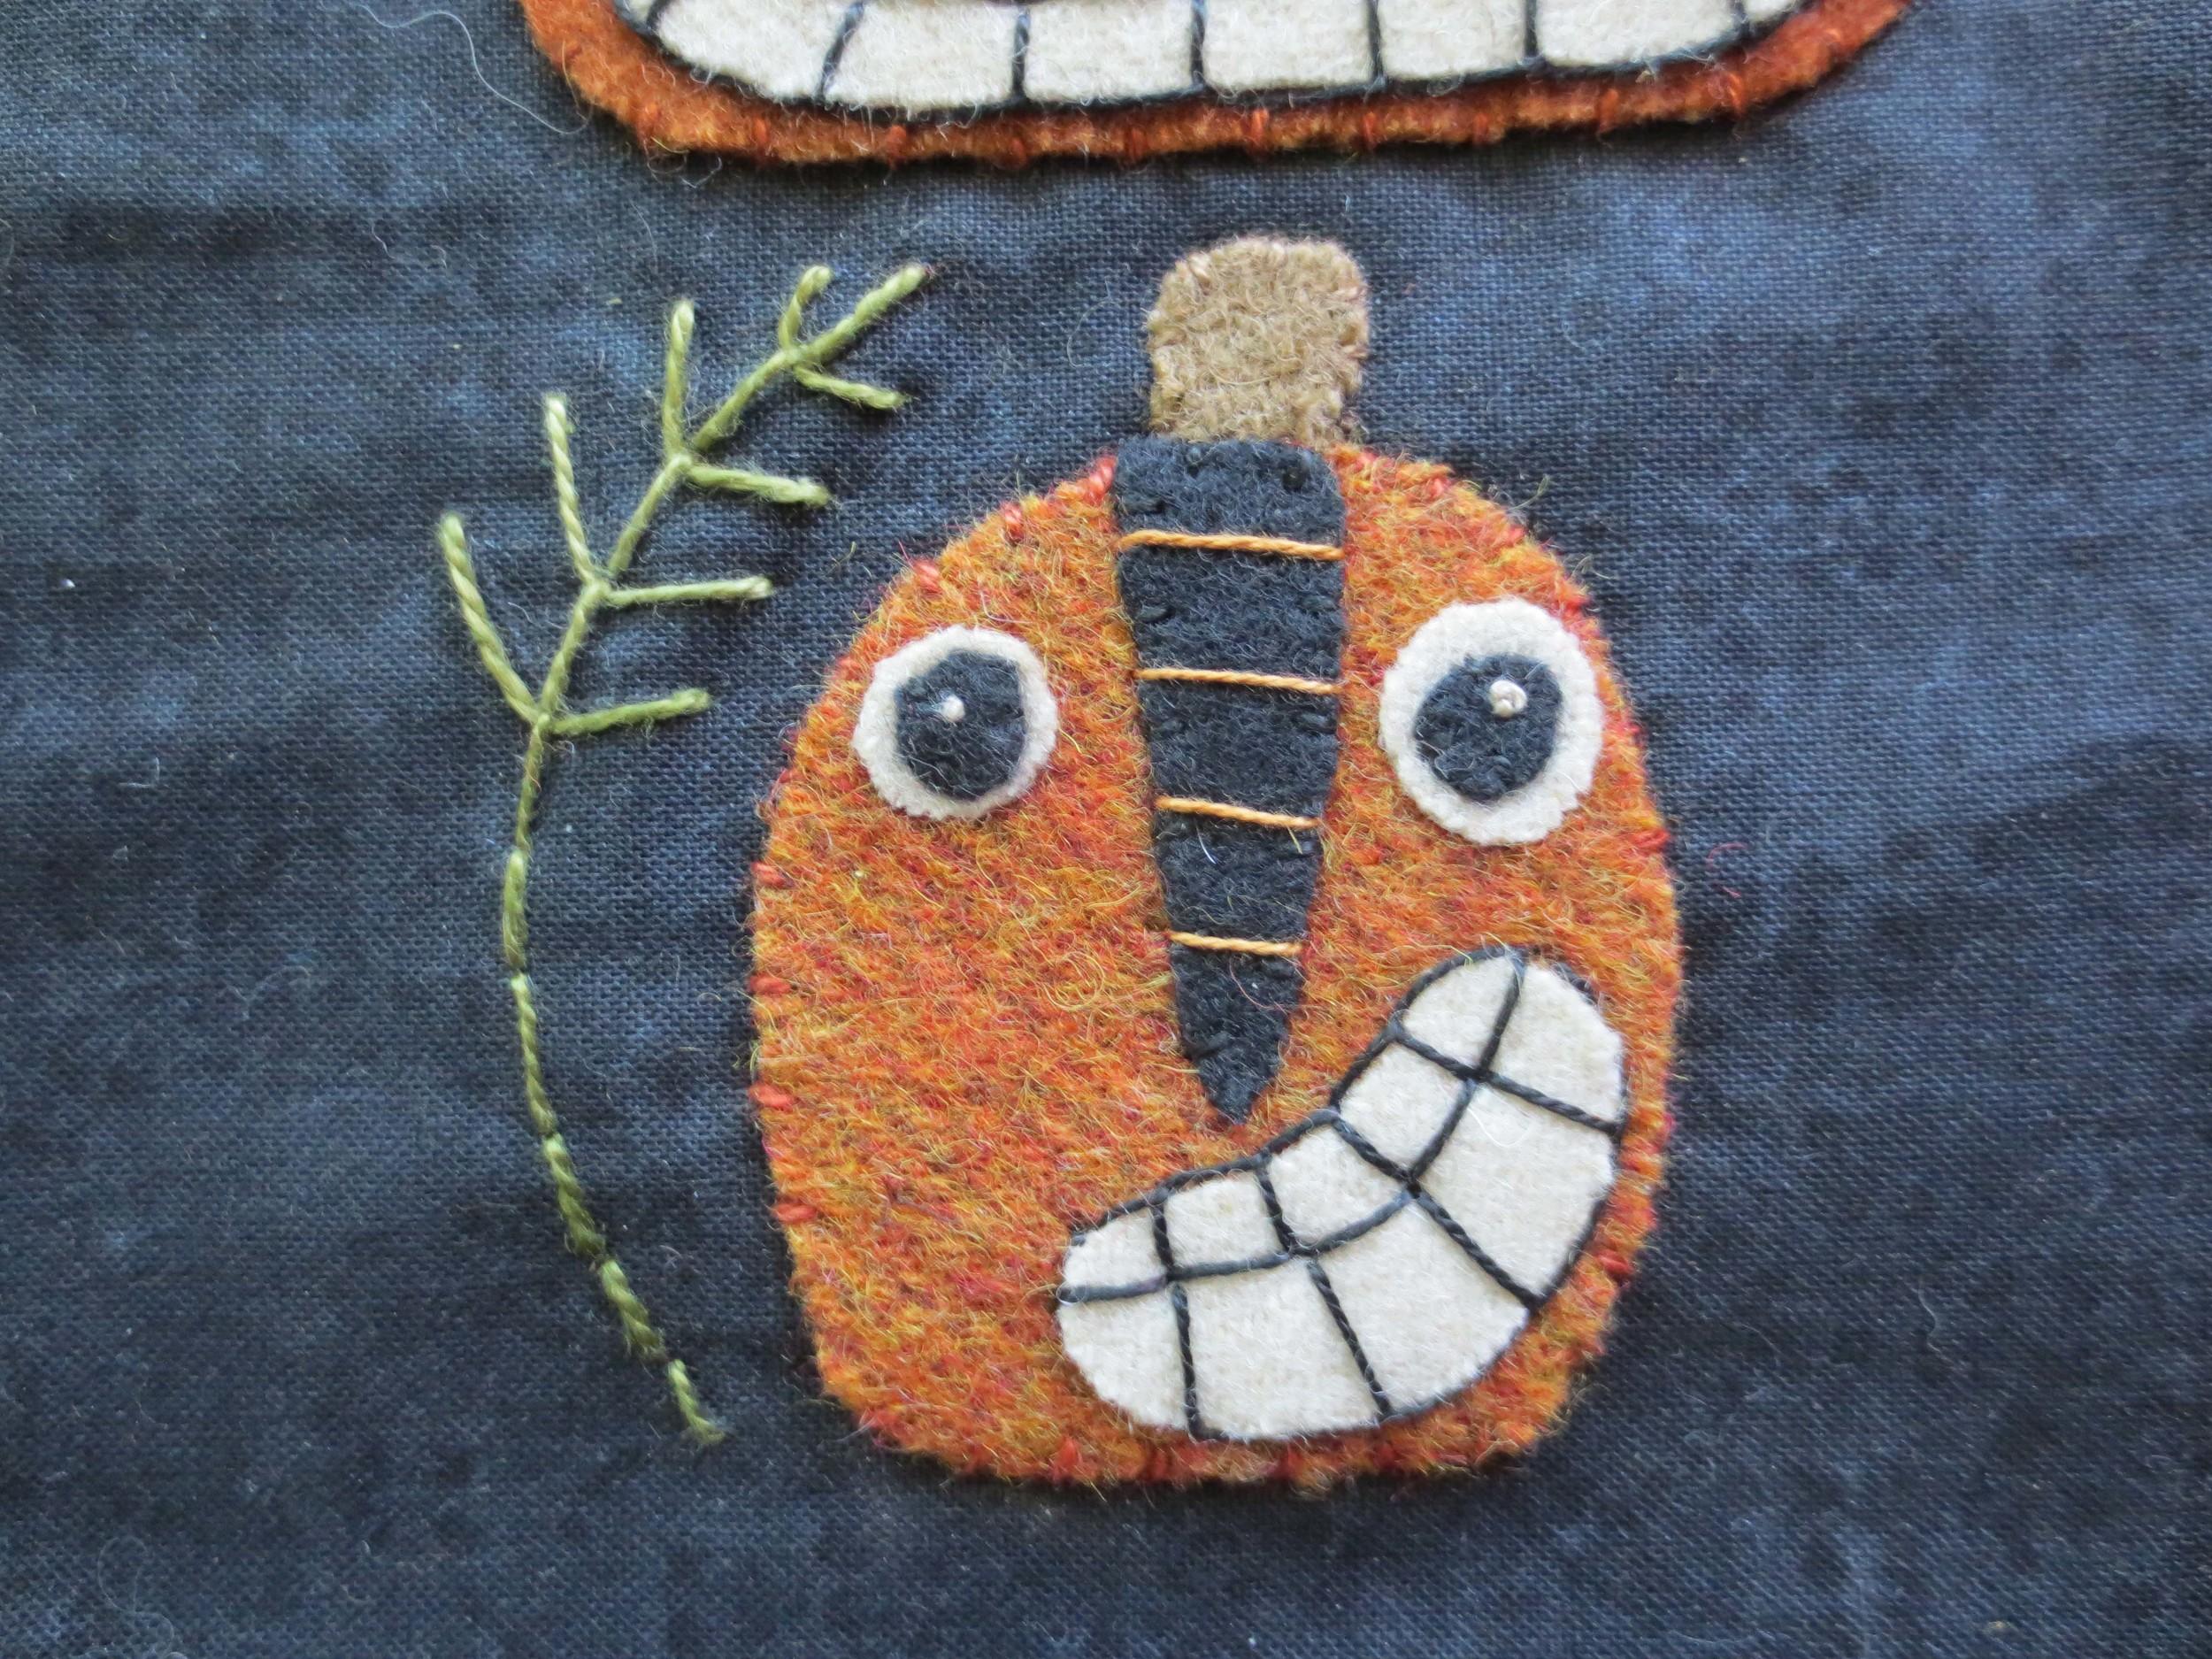 Back stitched stem